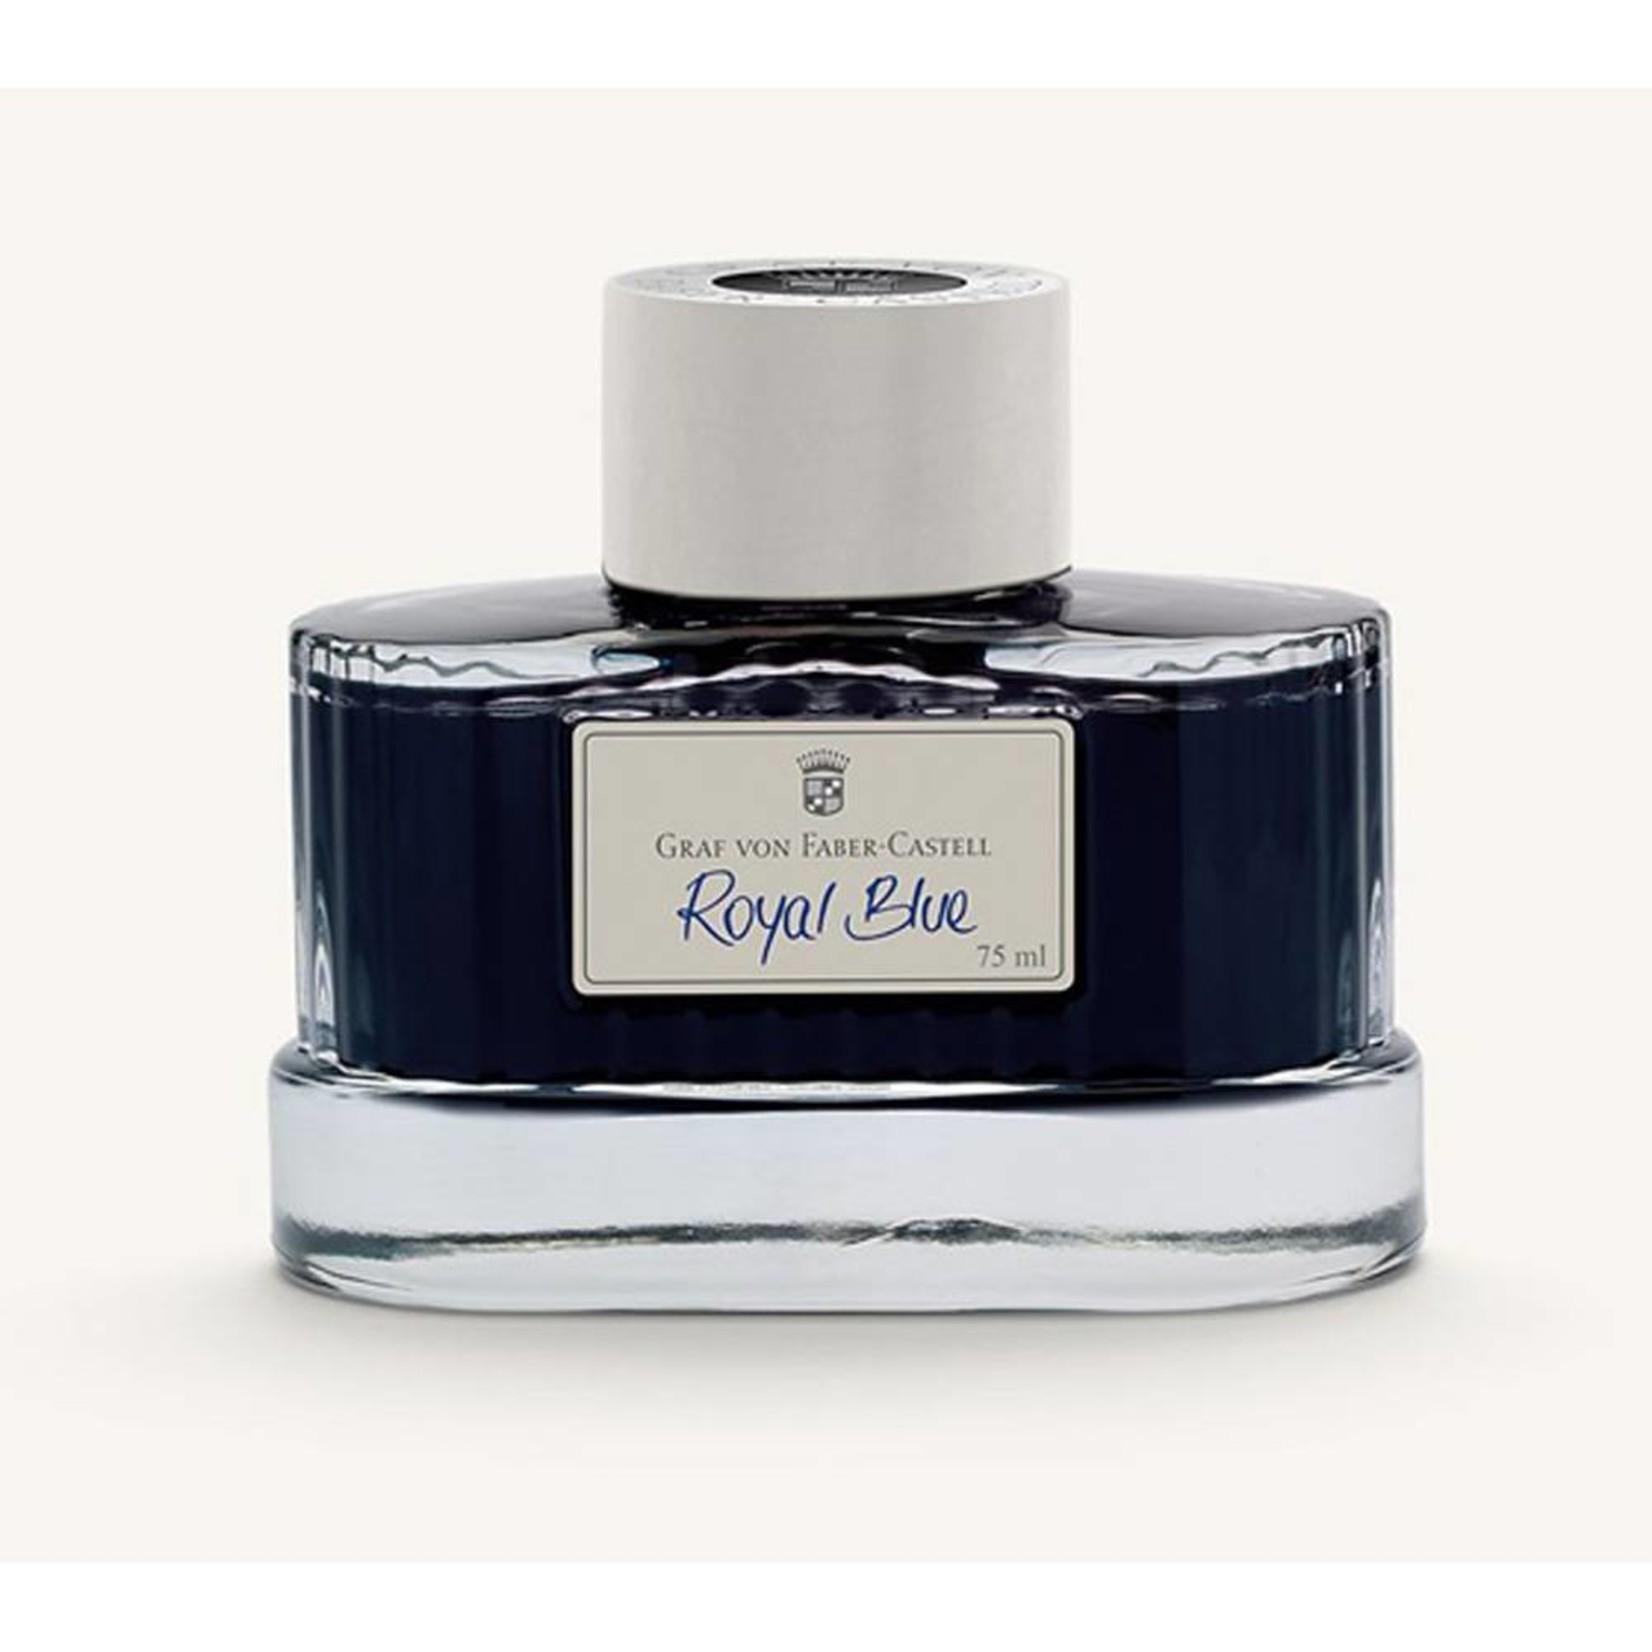 Graf von Faber-Castell GvFC Tintenglas 75ml Royal Blue